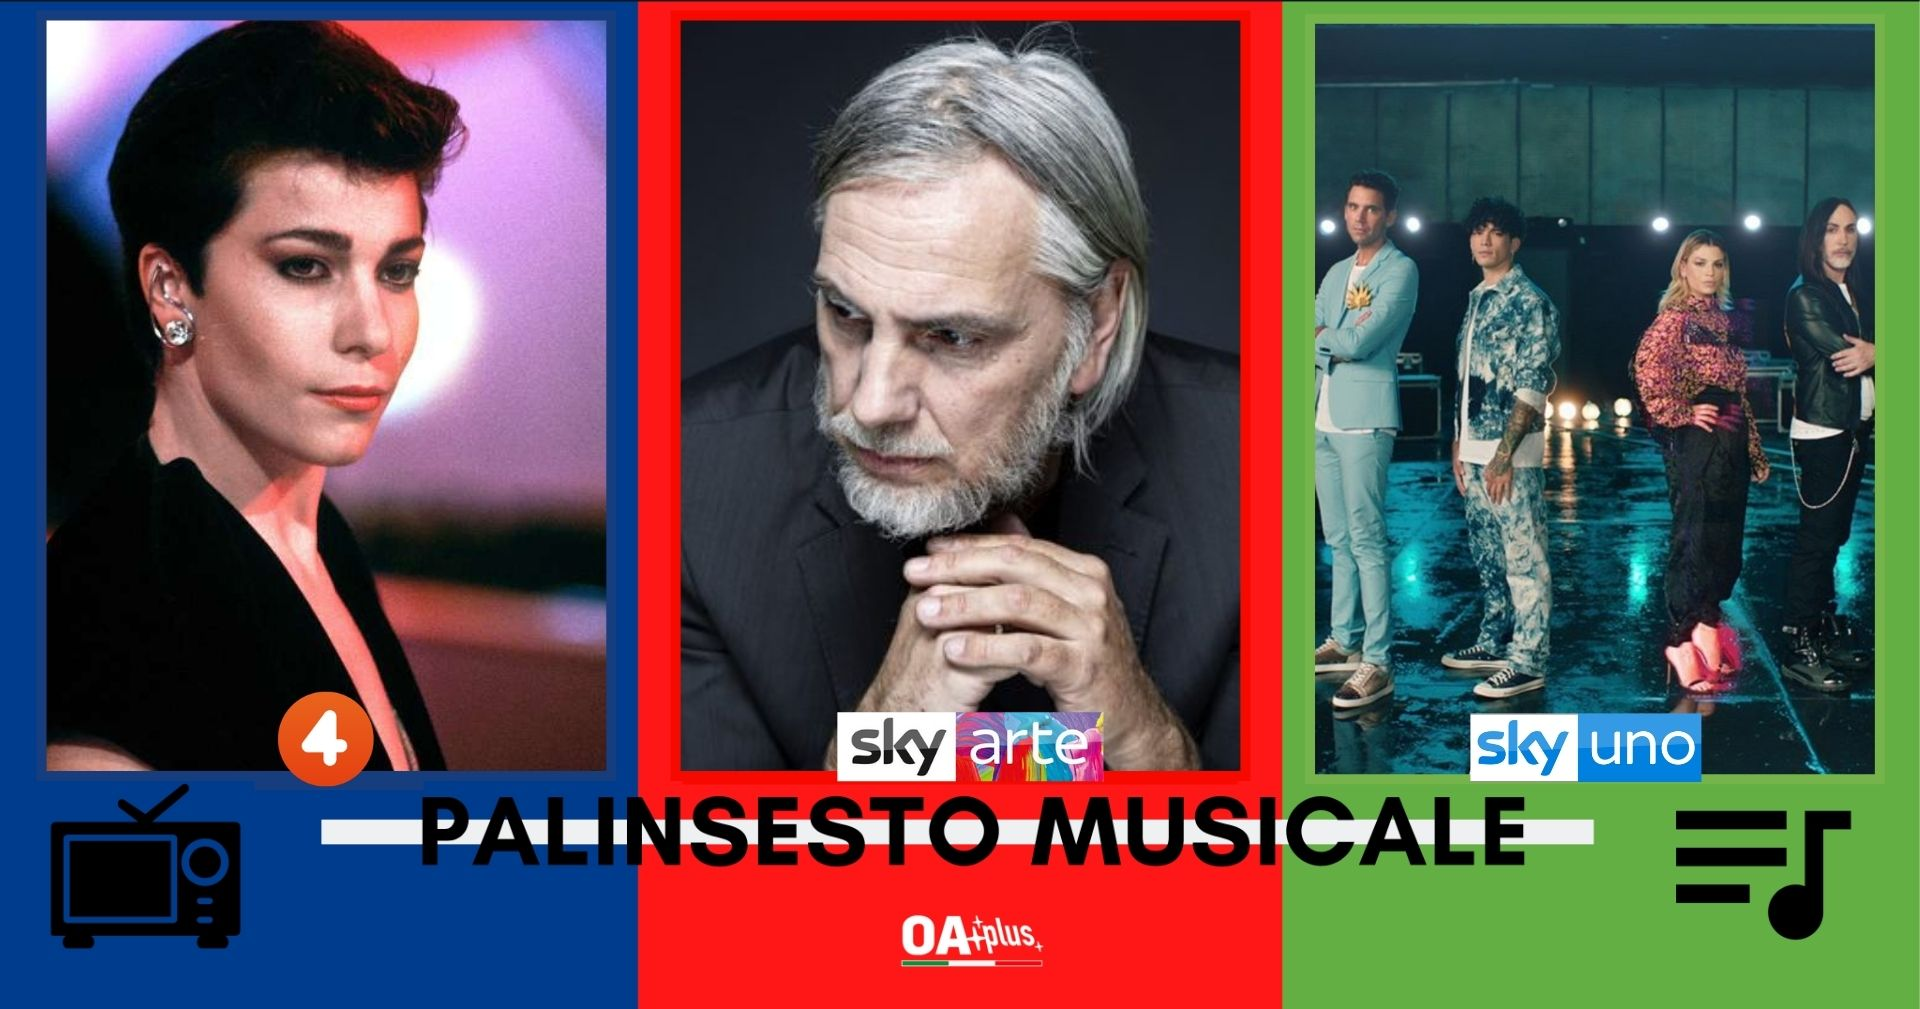 Rubrica, PALINSESTO MUSICALE: Giuni Russo, Paolo Benvegnù, X Factor 2020